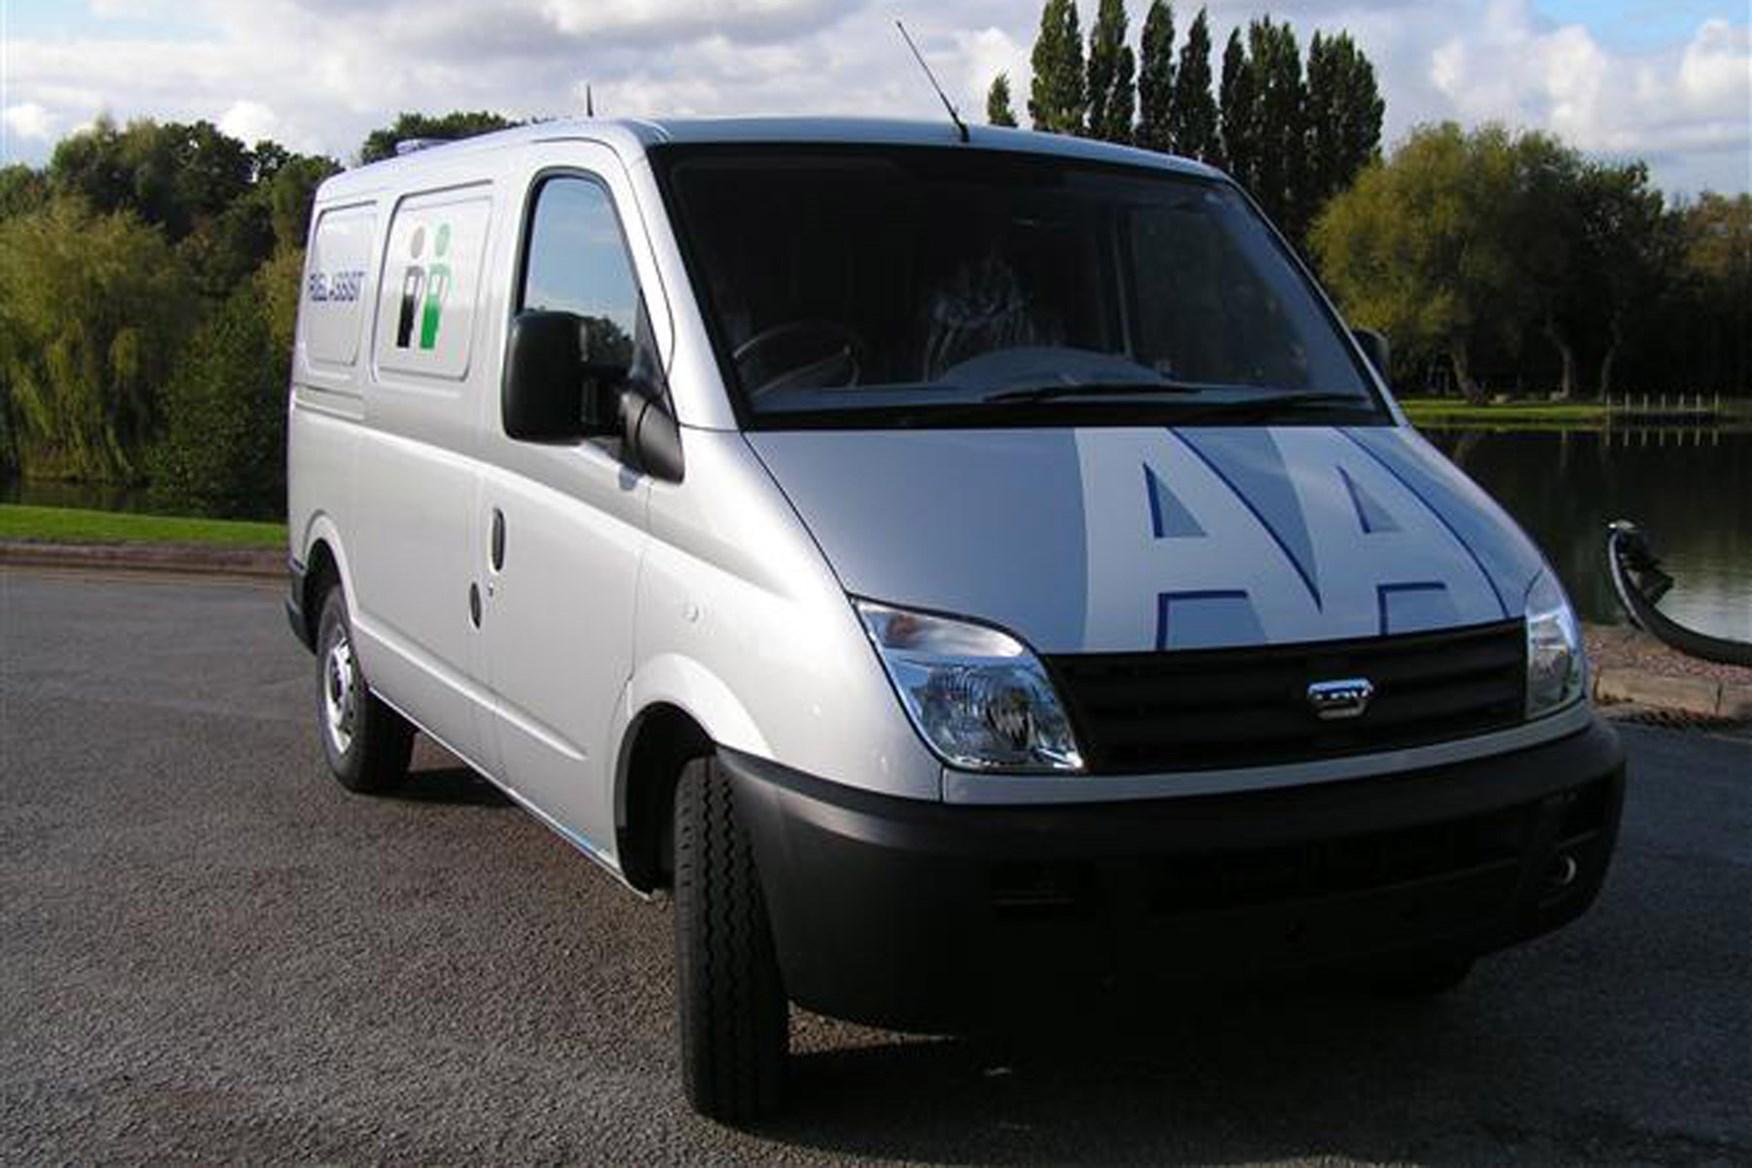 LDV Maxus review on Parkers Vans - front exterior